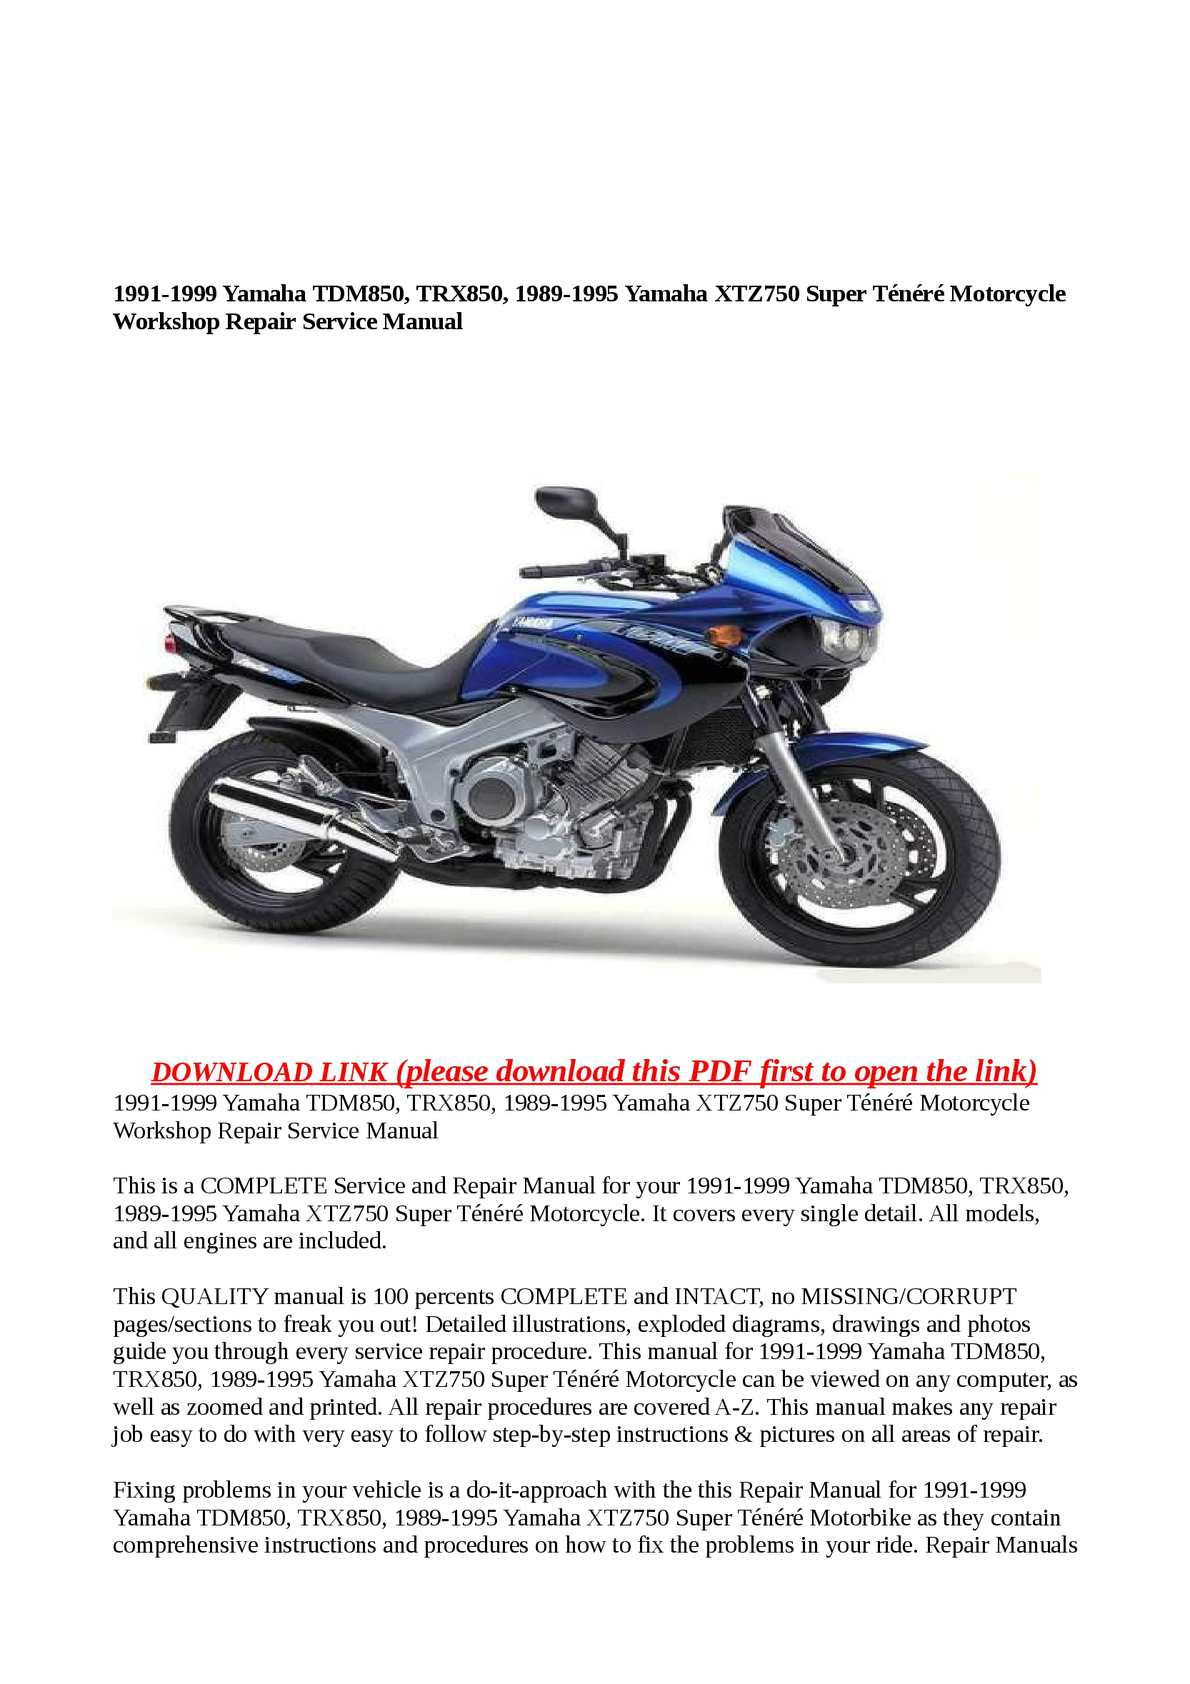 download now yamaha xtz750 xtz 750 super tenere service repair workshop manual